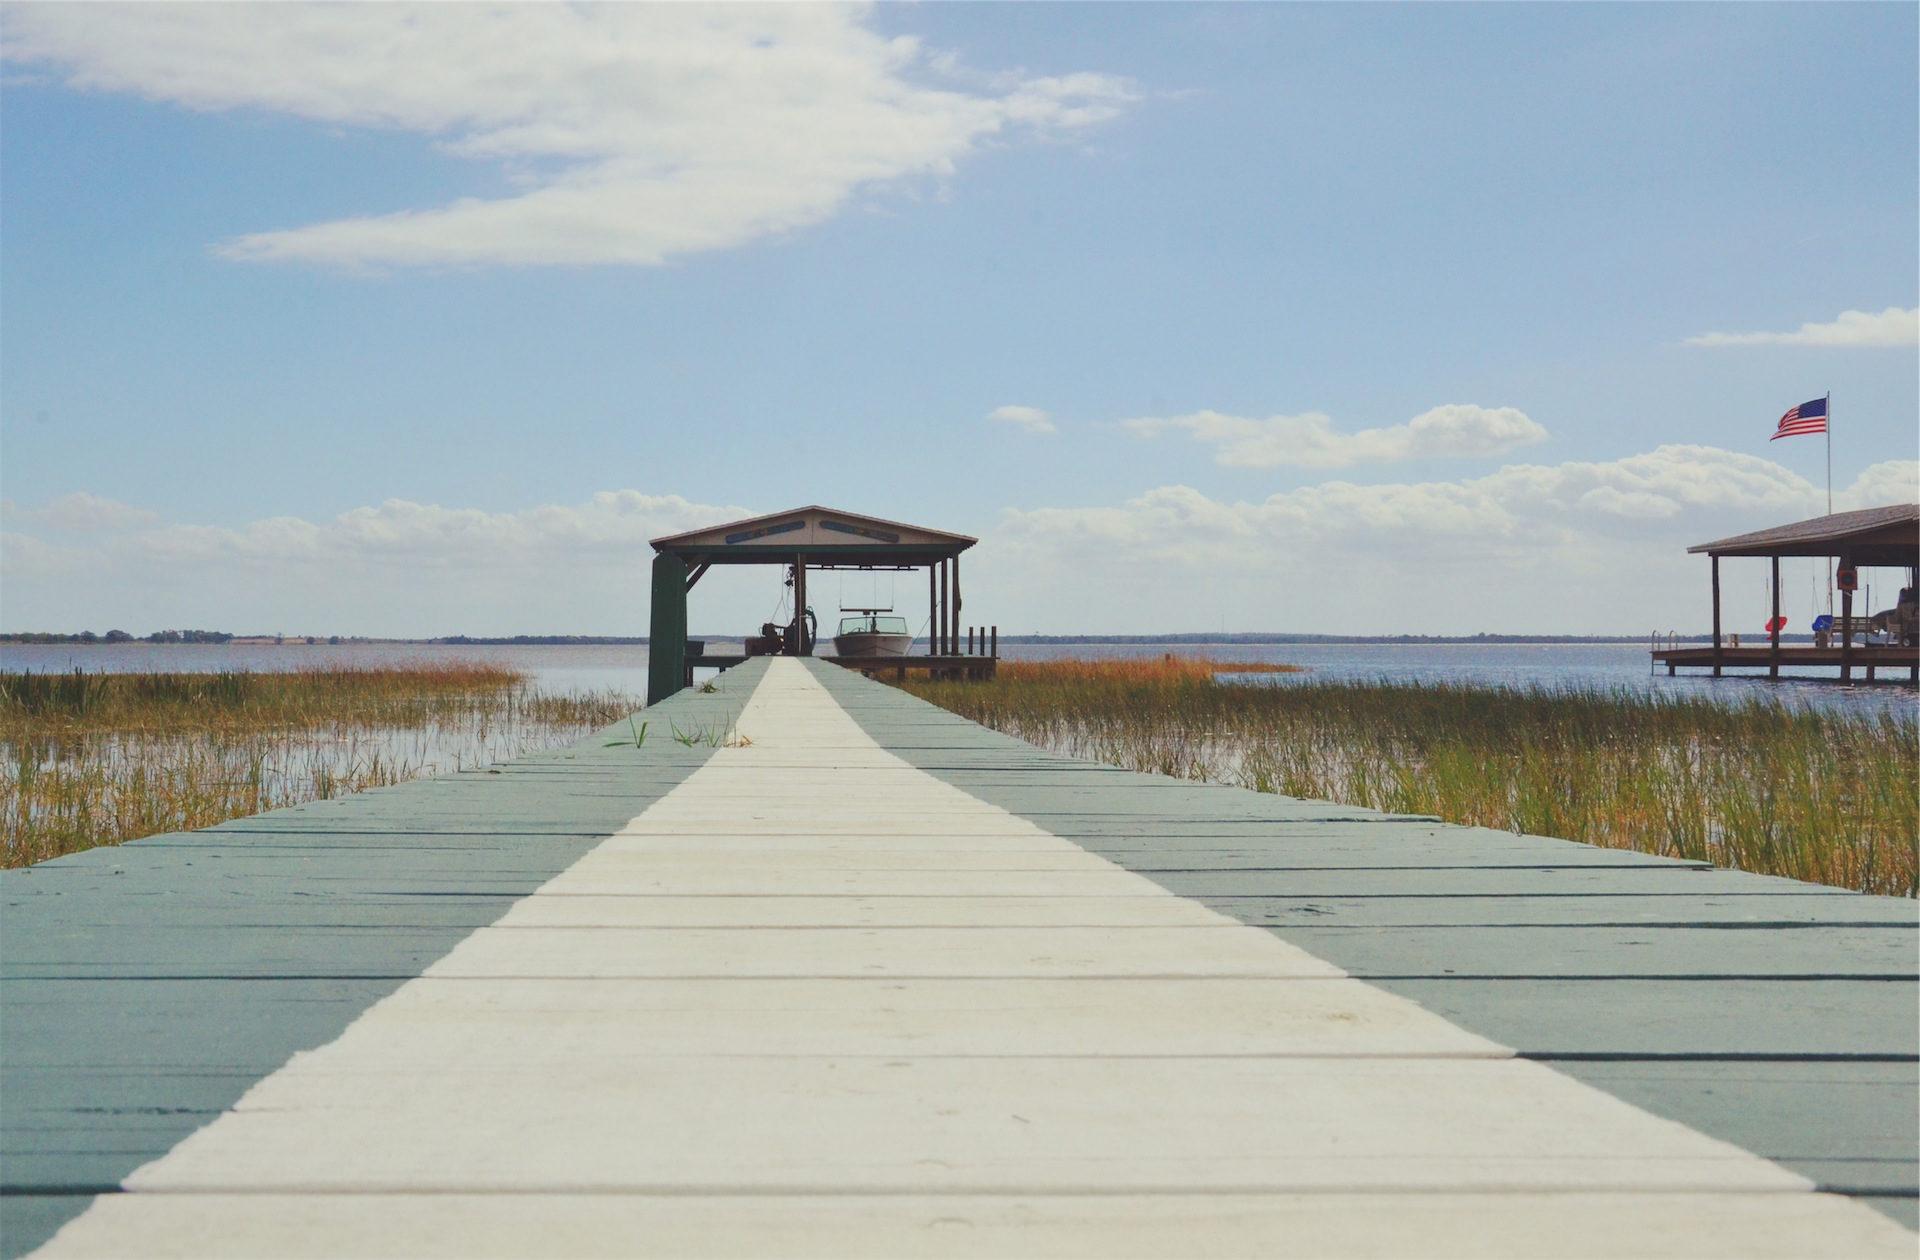 Весна, лодка, Озеро, Барка, столы - Обои HD - Профессор falken.com